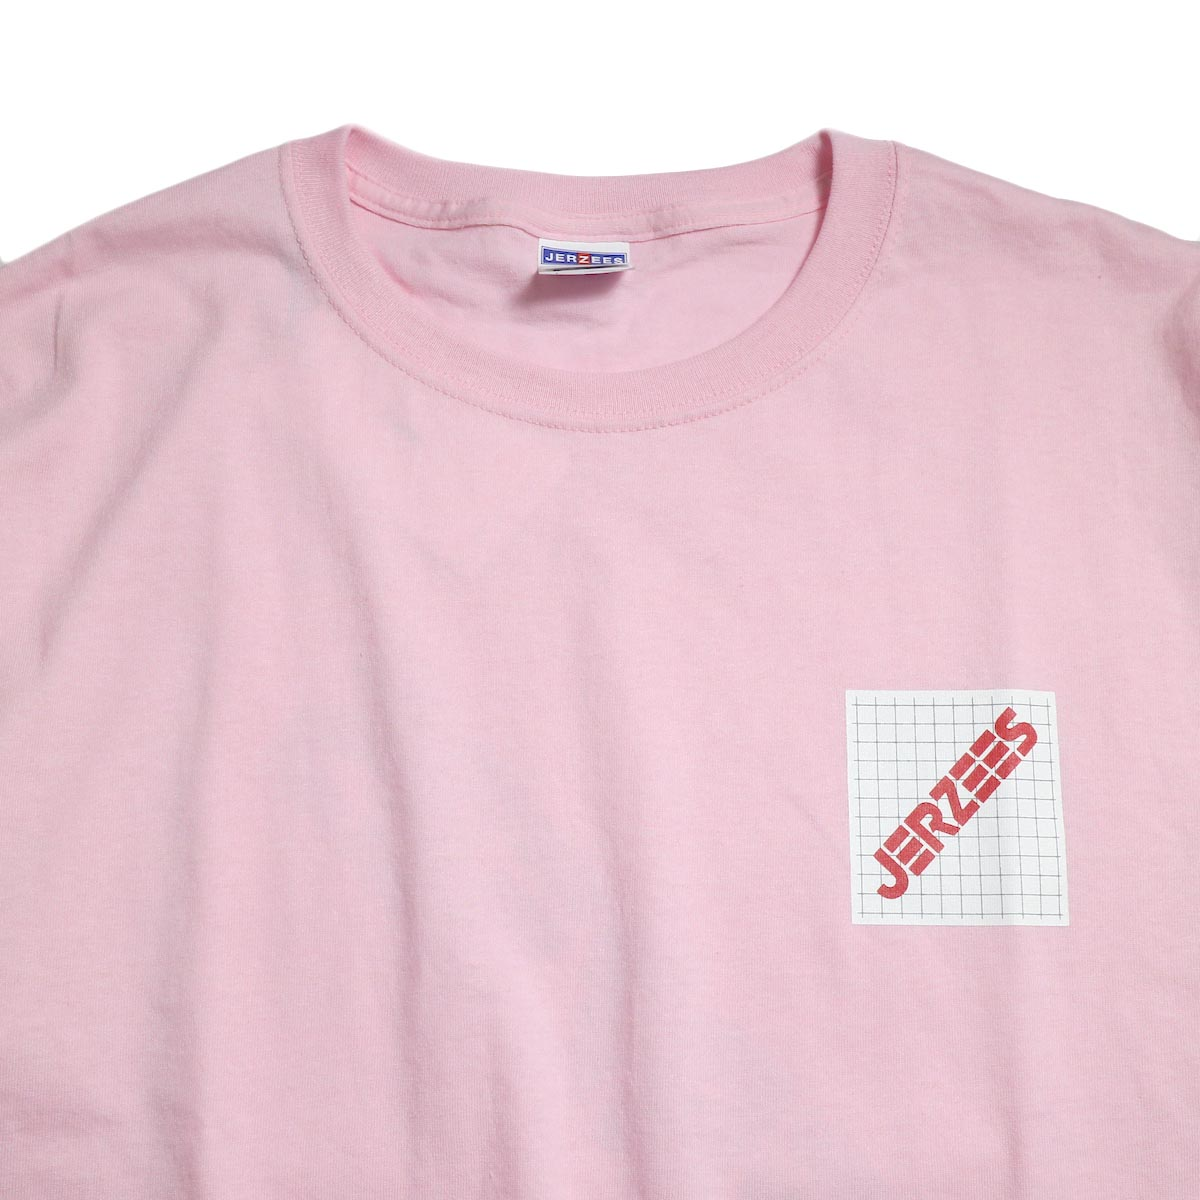 N.HOOLYWOOD × JERZEES  / 191-CS44-070 Short Sleeve Tee -Pink 襟